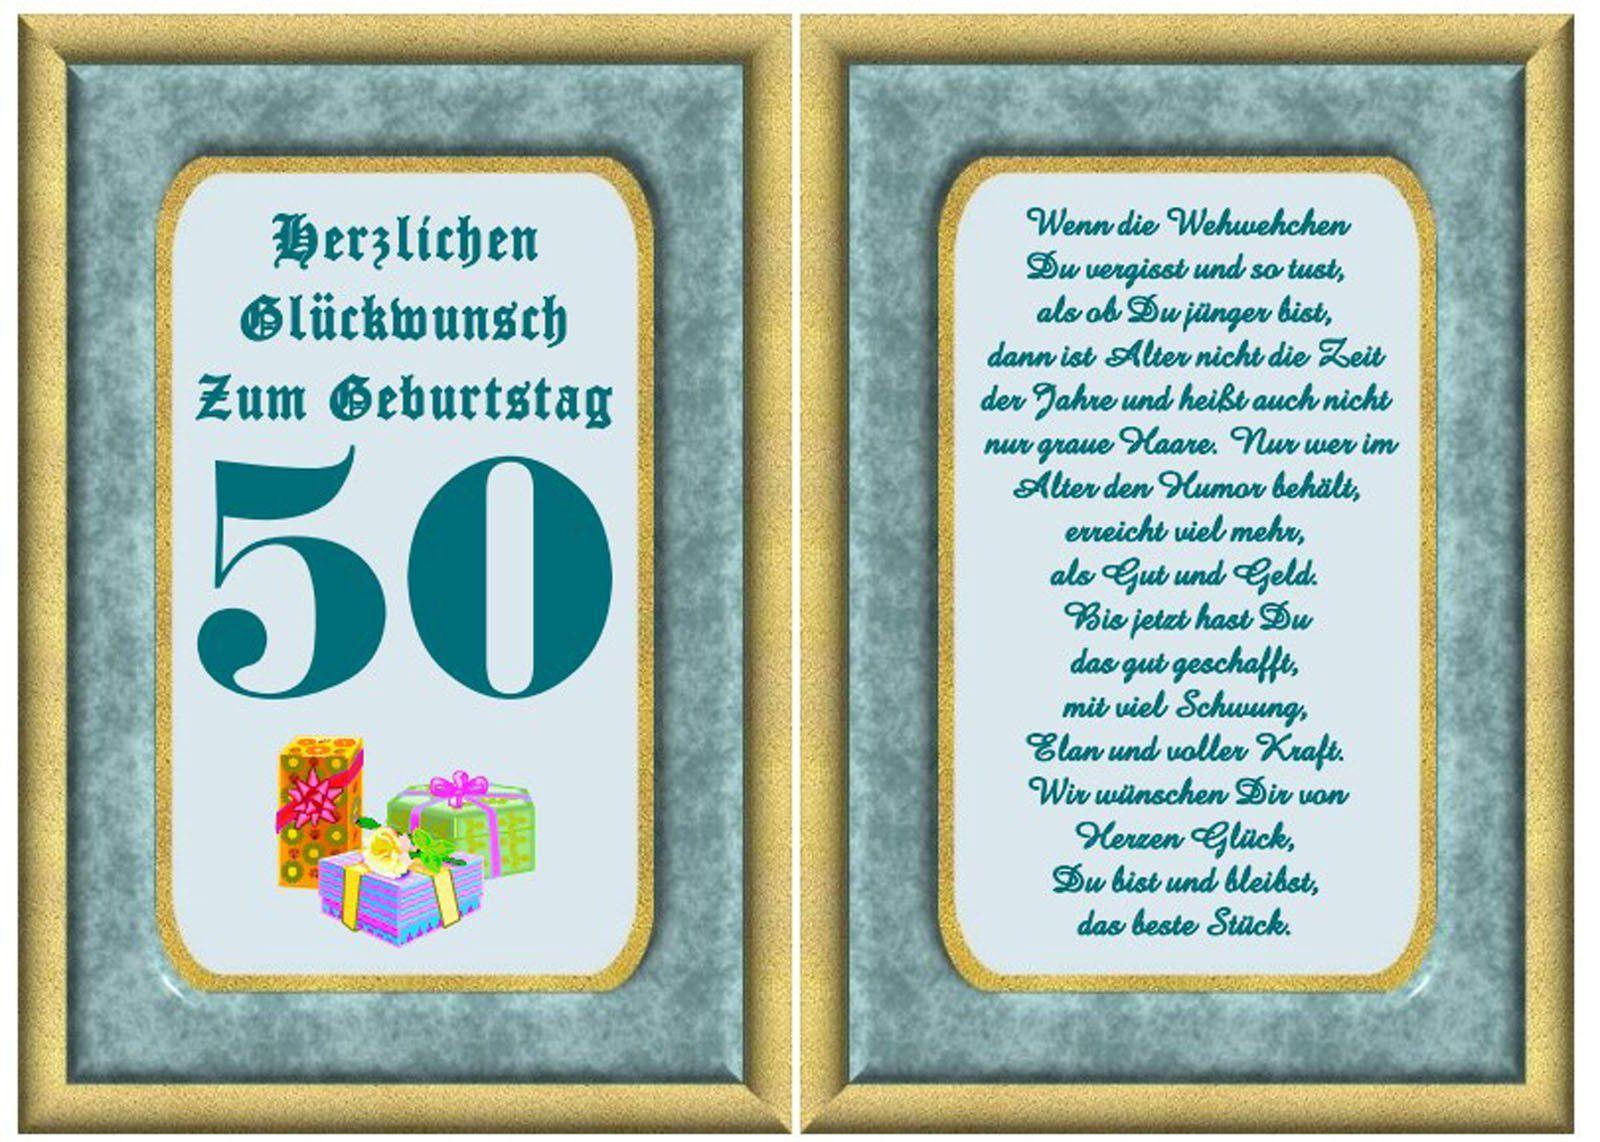 Einladung 50 Geburtstag In 2020 Einladung Geburtstag Einladung